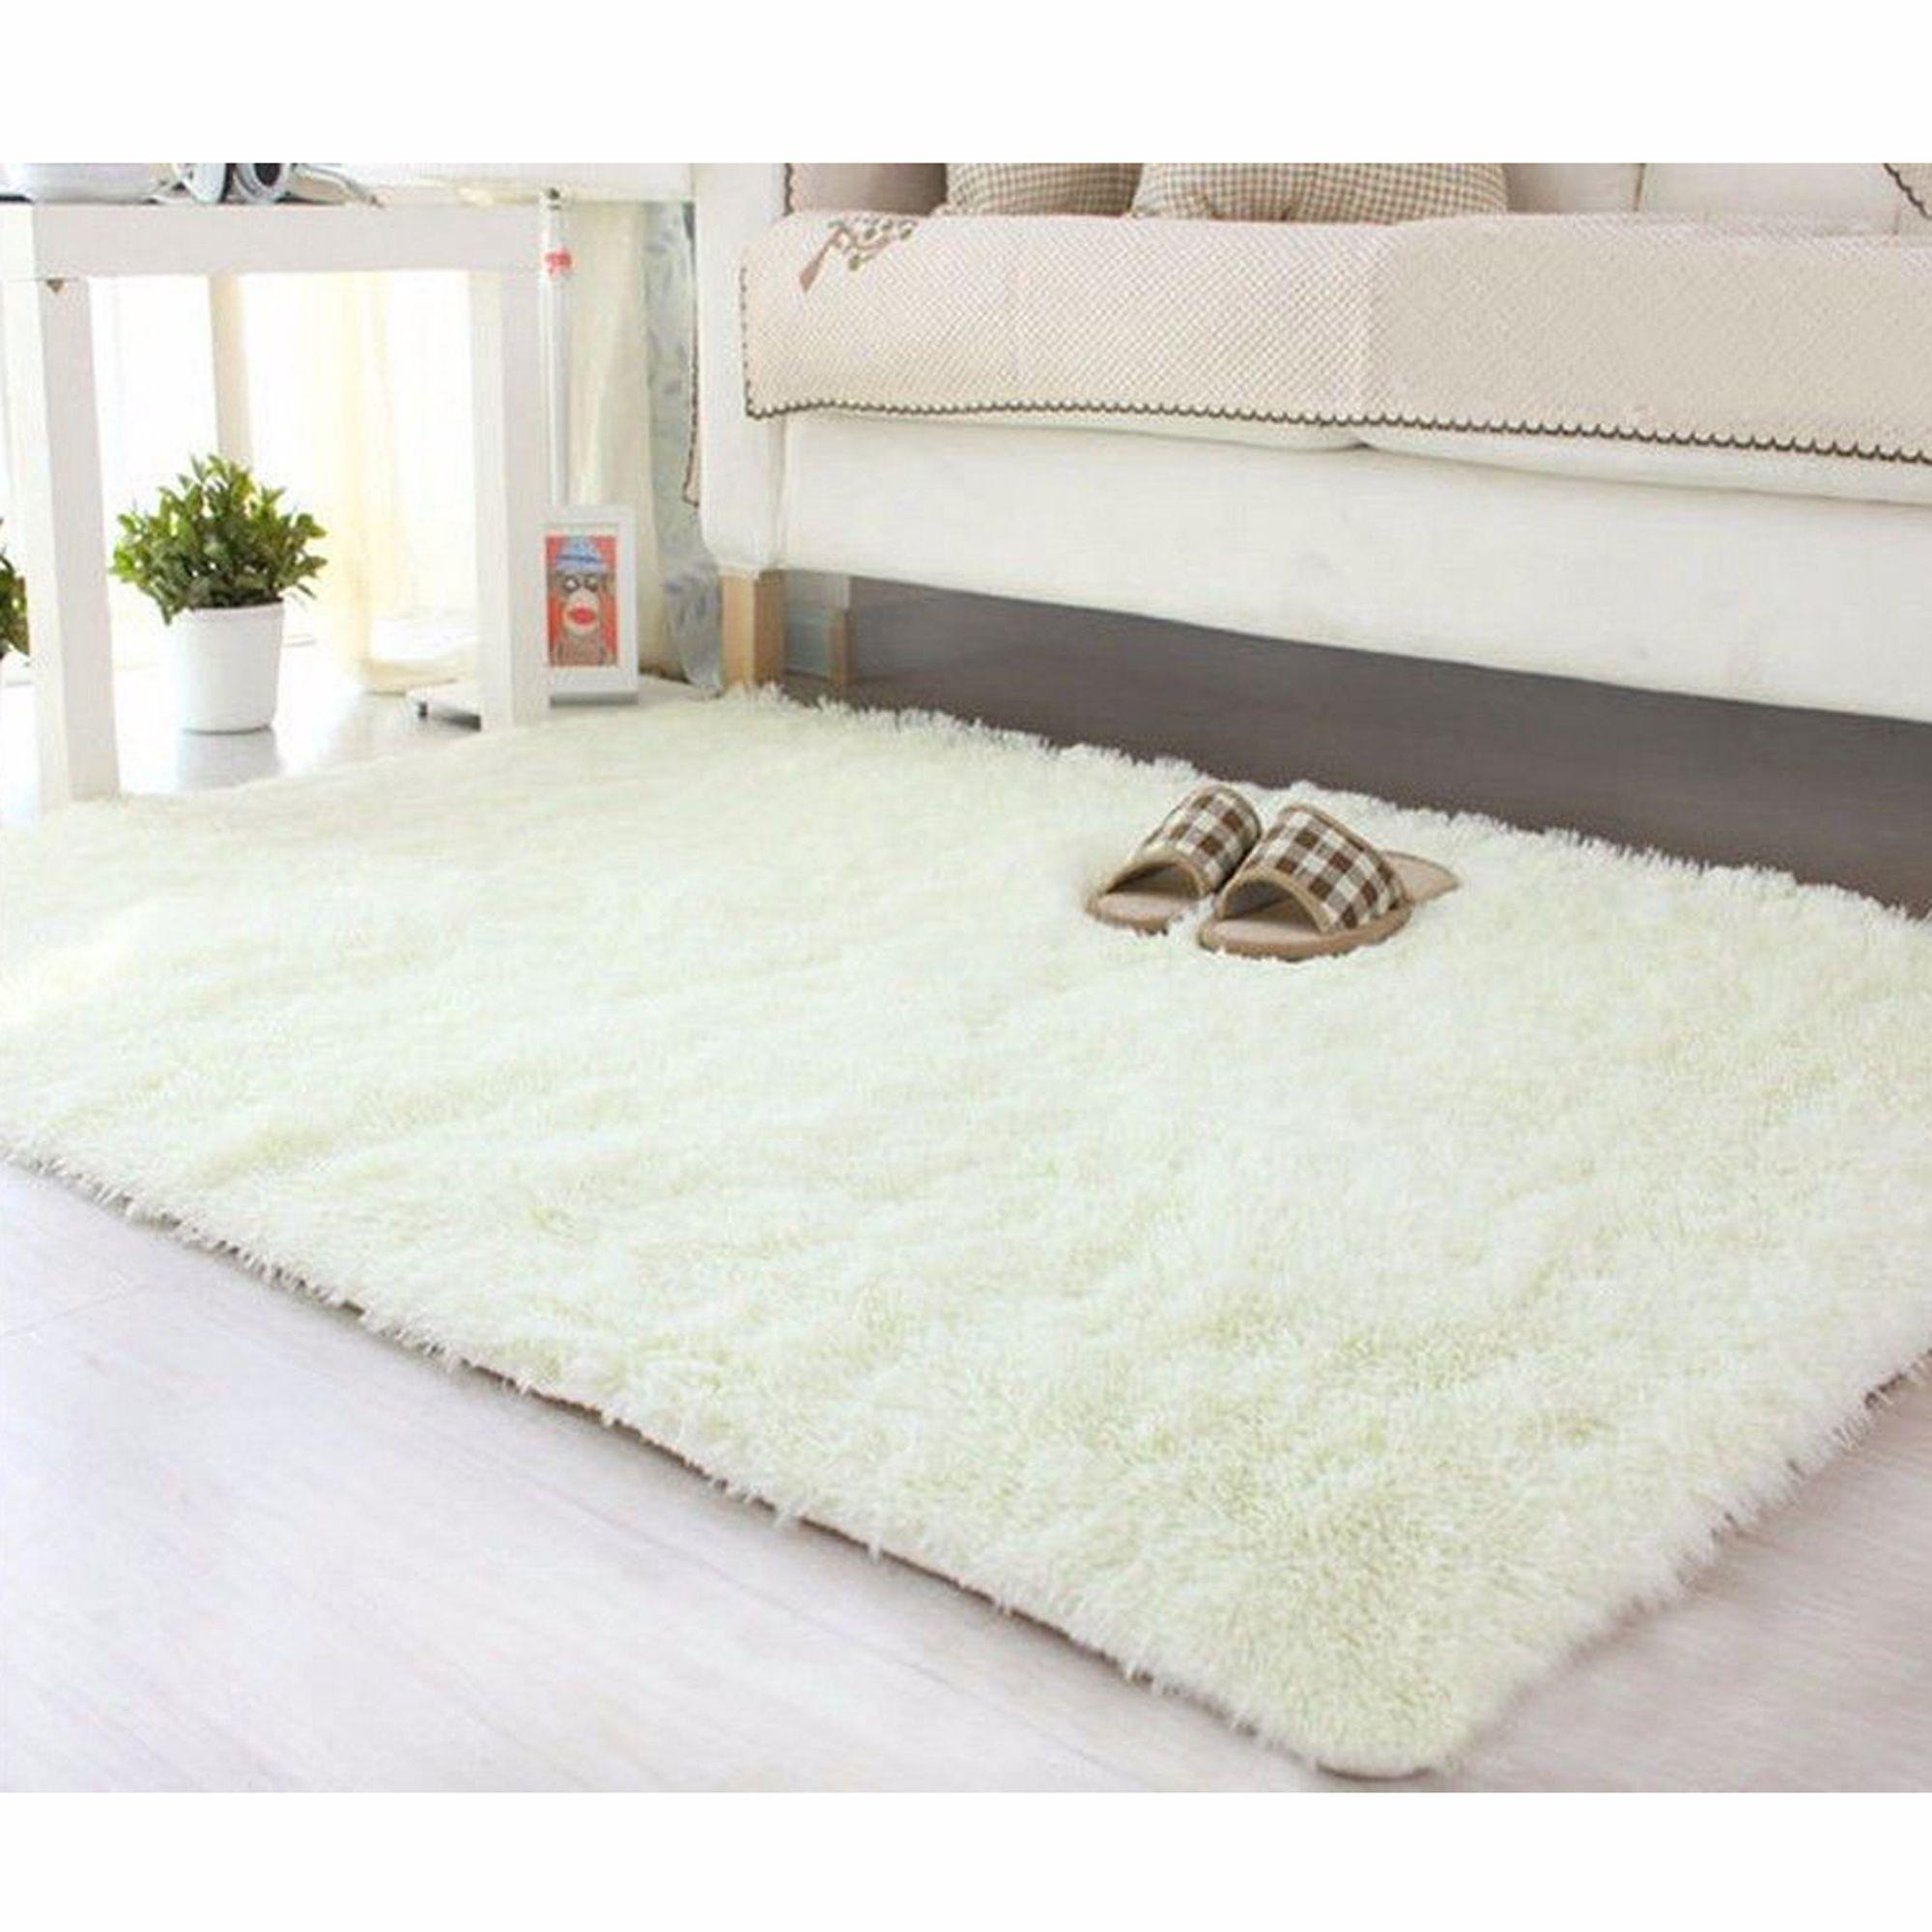 Home Area Rug Dining Room Rugs On Carpet Bedroom Flooring